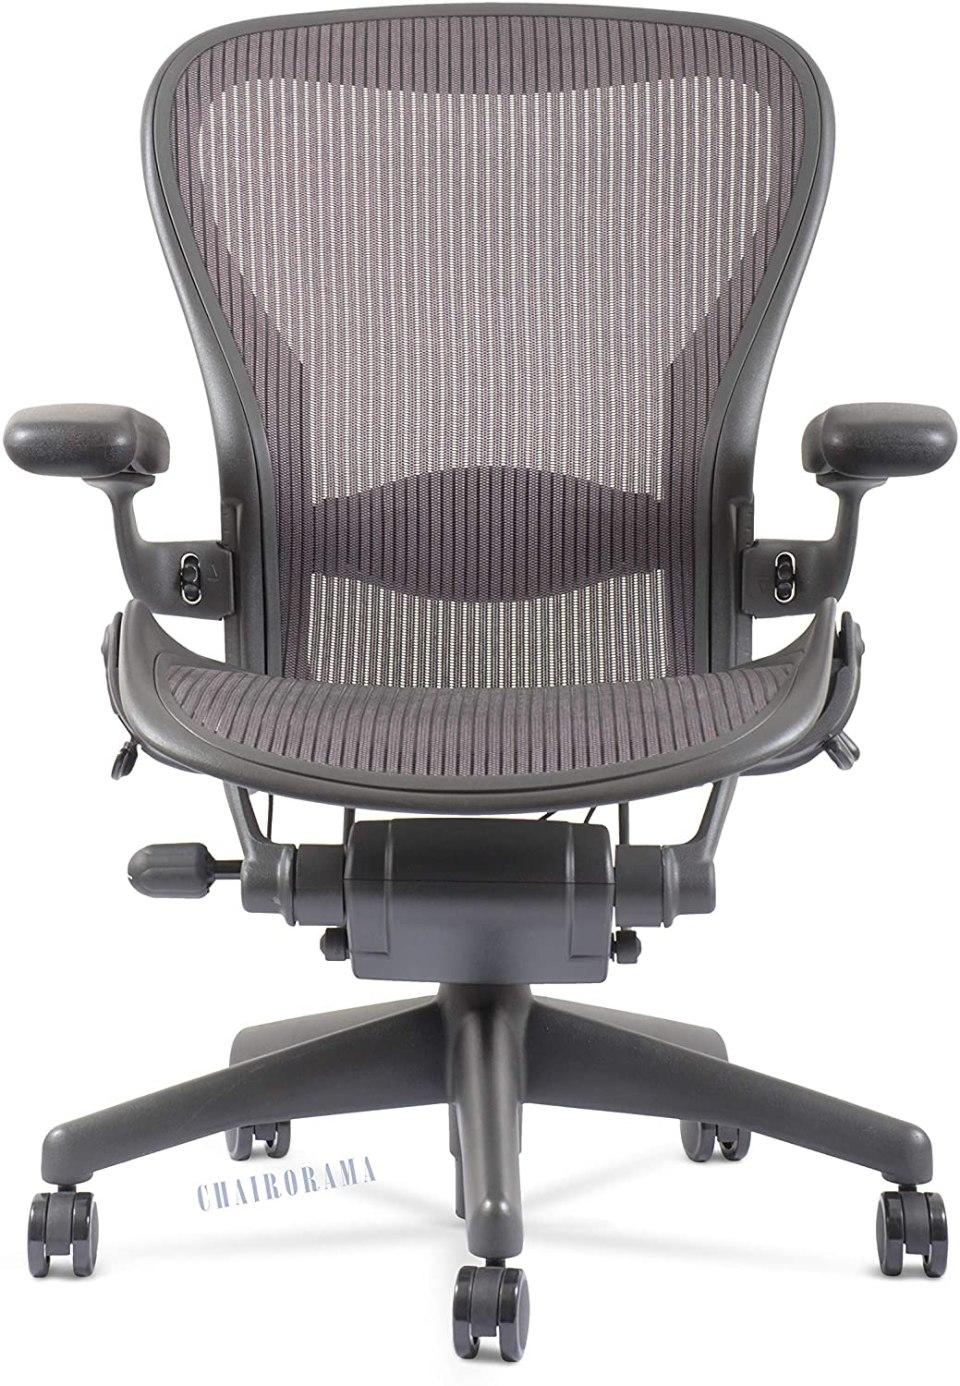 Most comfortable chair - high end - Herman Miller Aeron